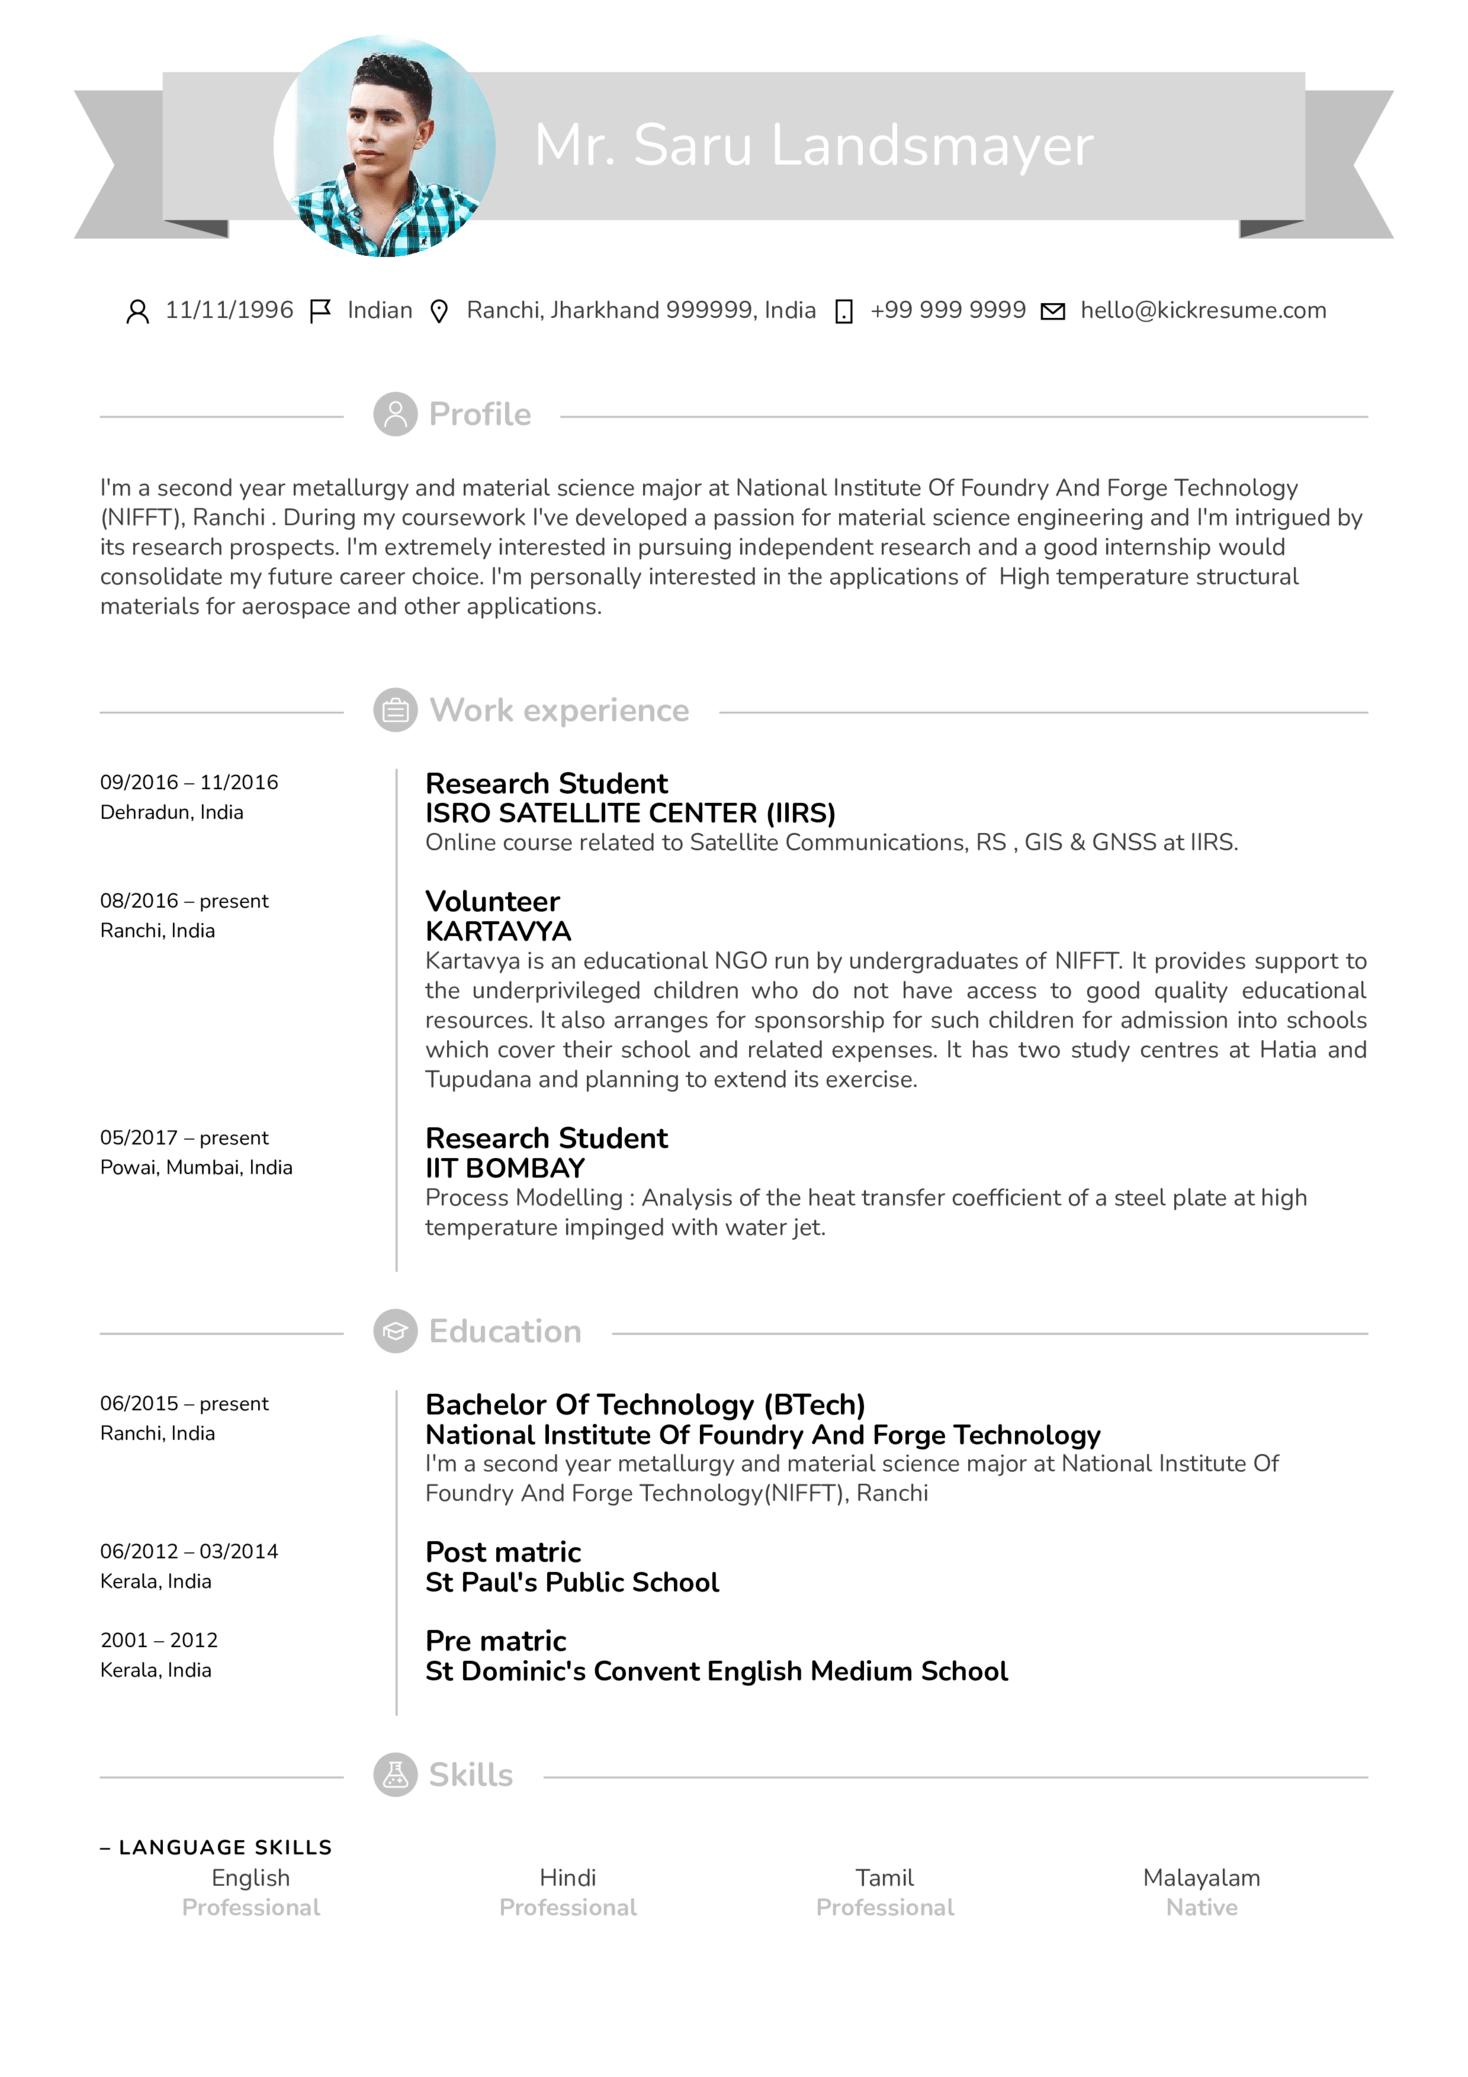 Research Intern Resume Sample (parte 1)